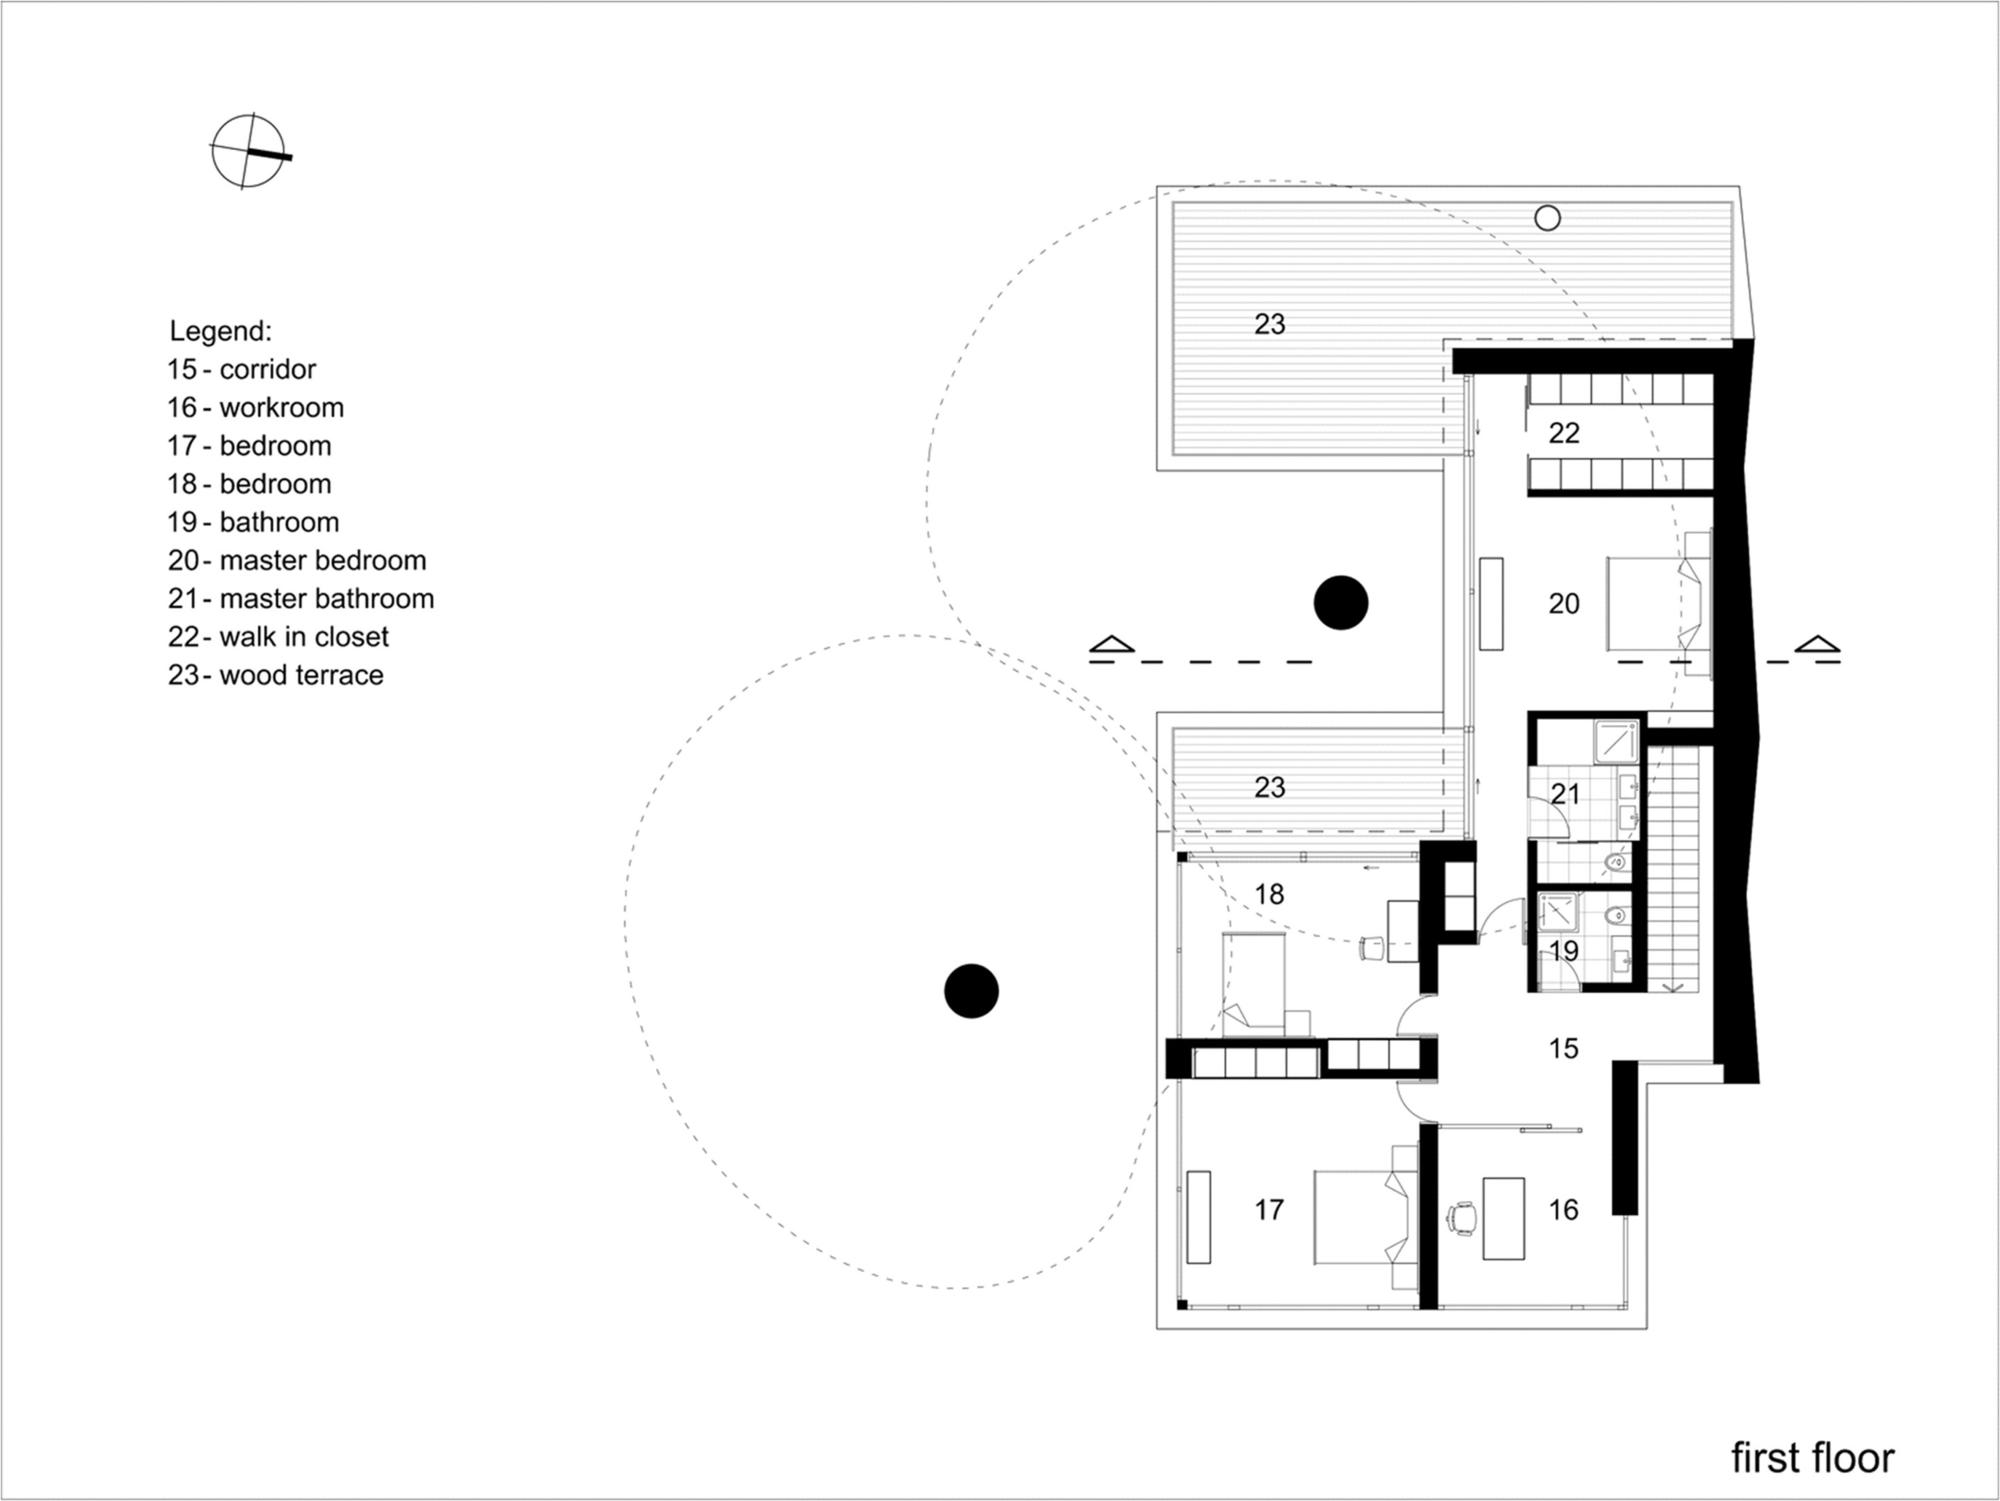 2-oaks-house-obia_obia_2oaks_drawing_02